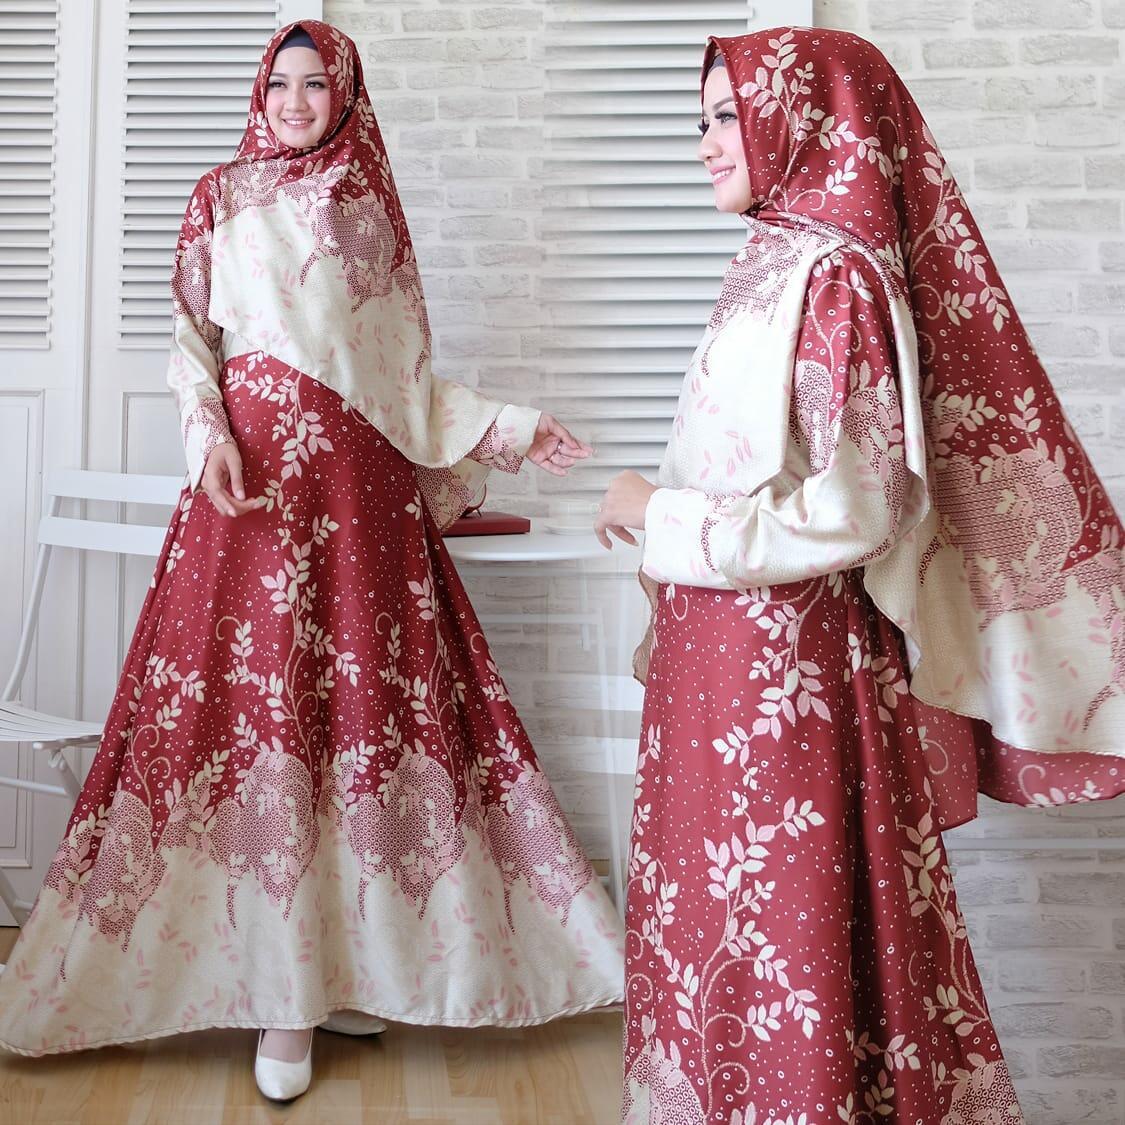 theclover gamis syari NAONA MAXI MARON/busana muslimah 5WARNA/DRESS MUSLIM/PAKAIAN WANITA MUSLIM